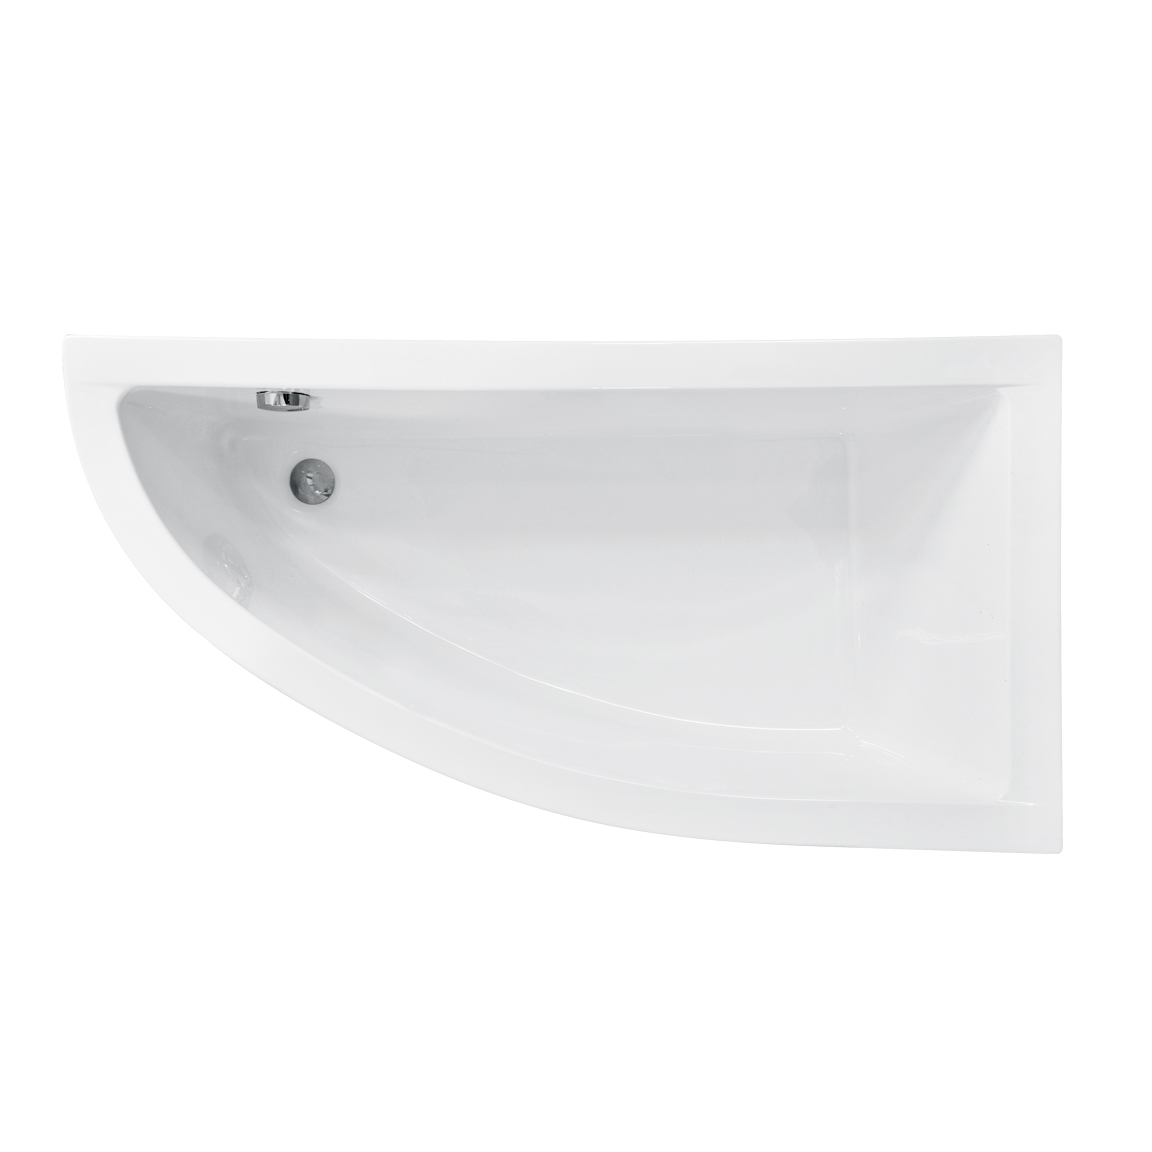 Акриловая ванна Besco Praktika 150x70 P цены онлайн